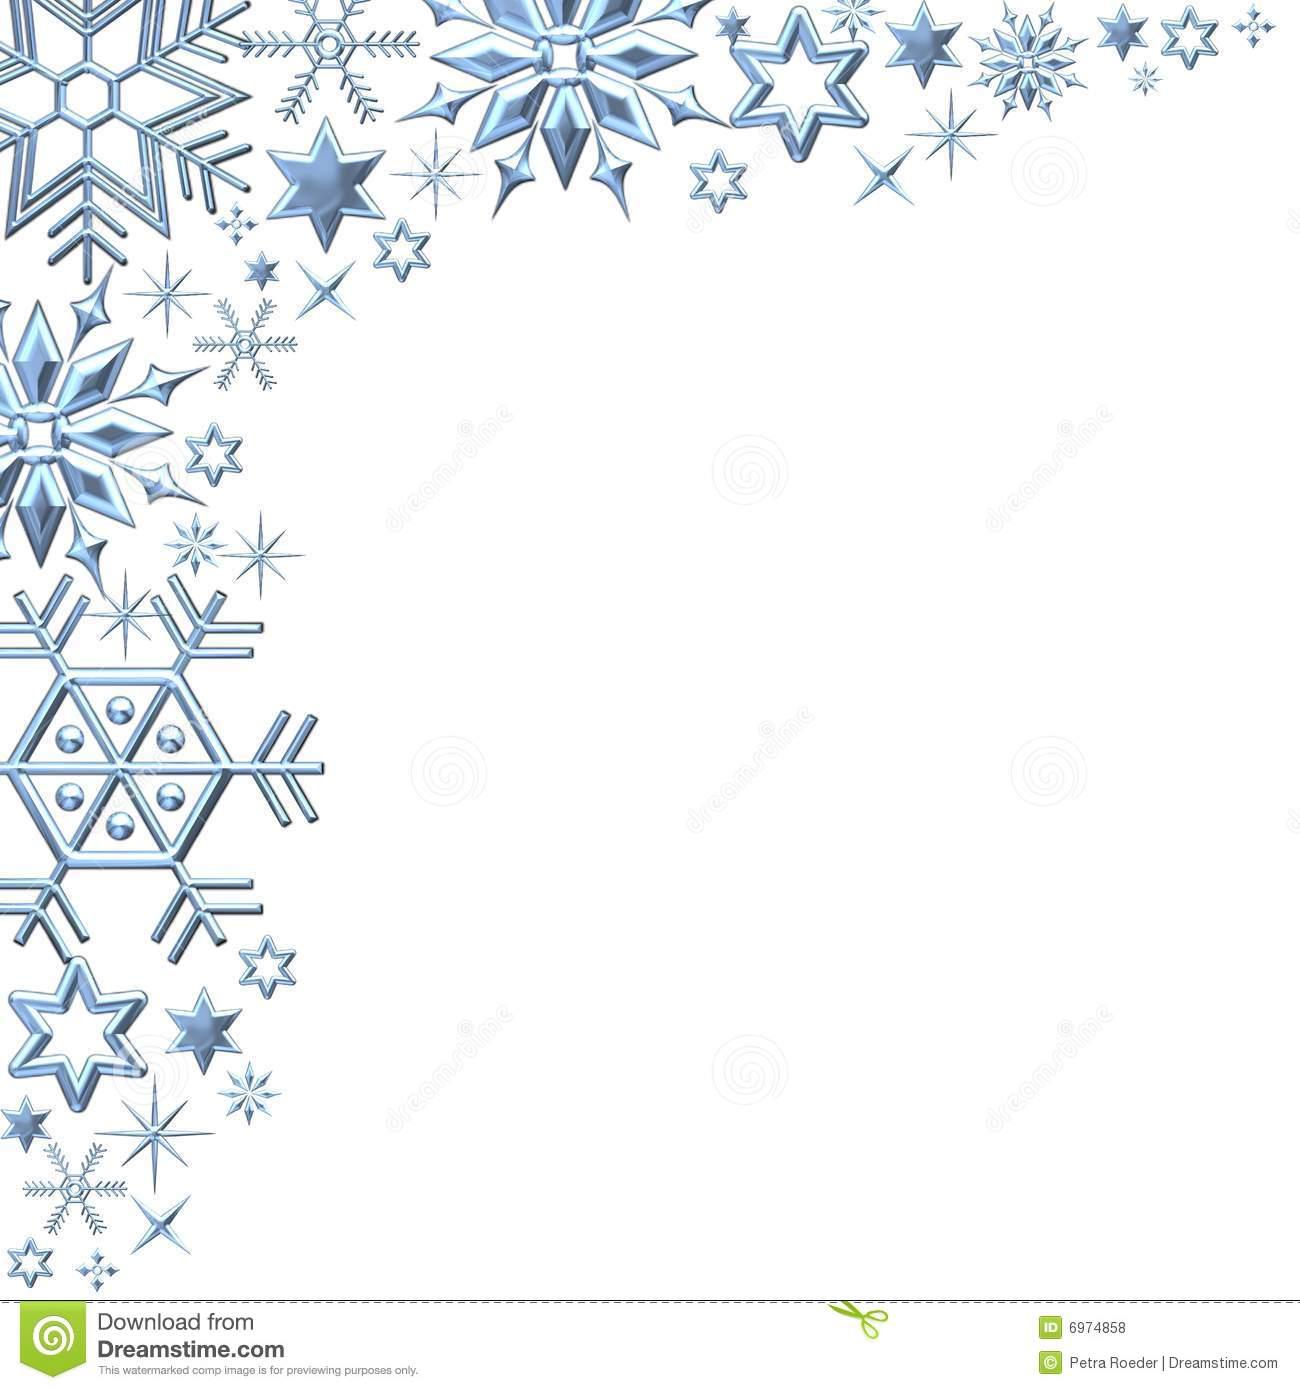 Snowflake Border Clipart